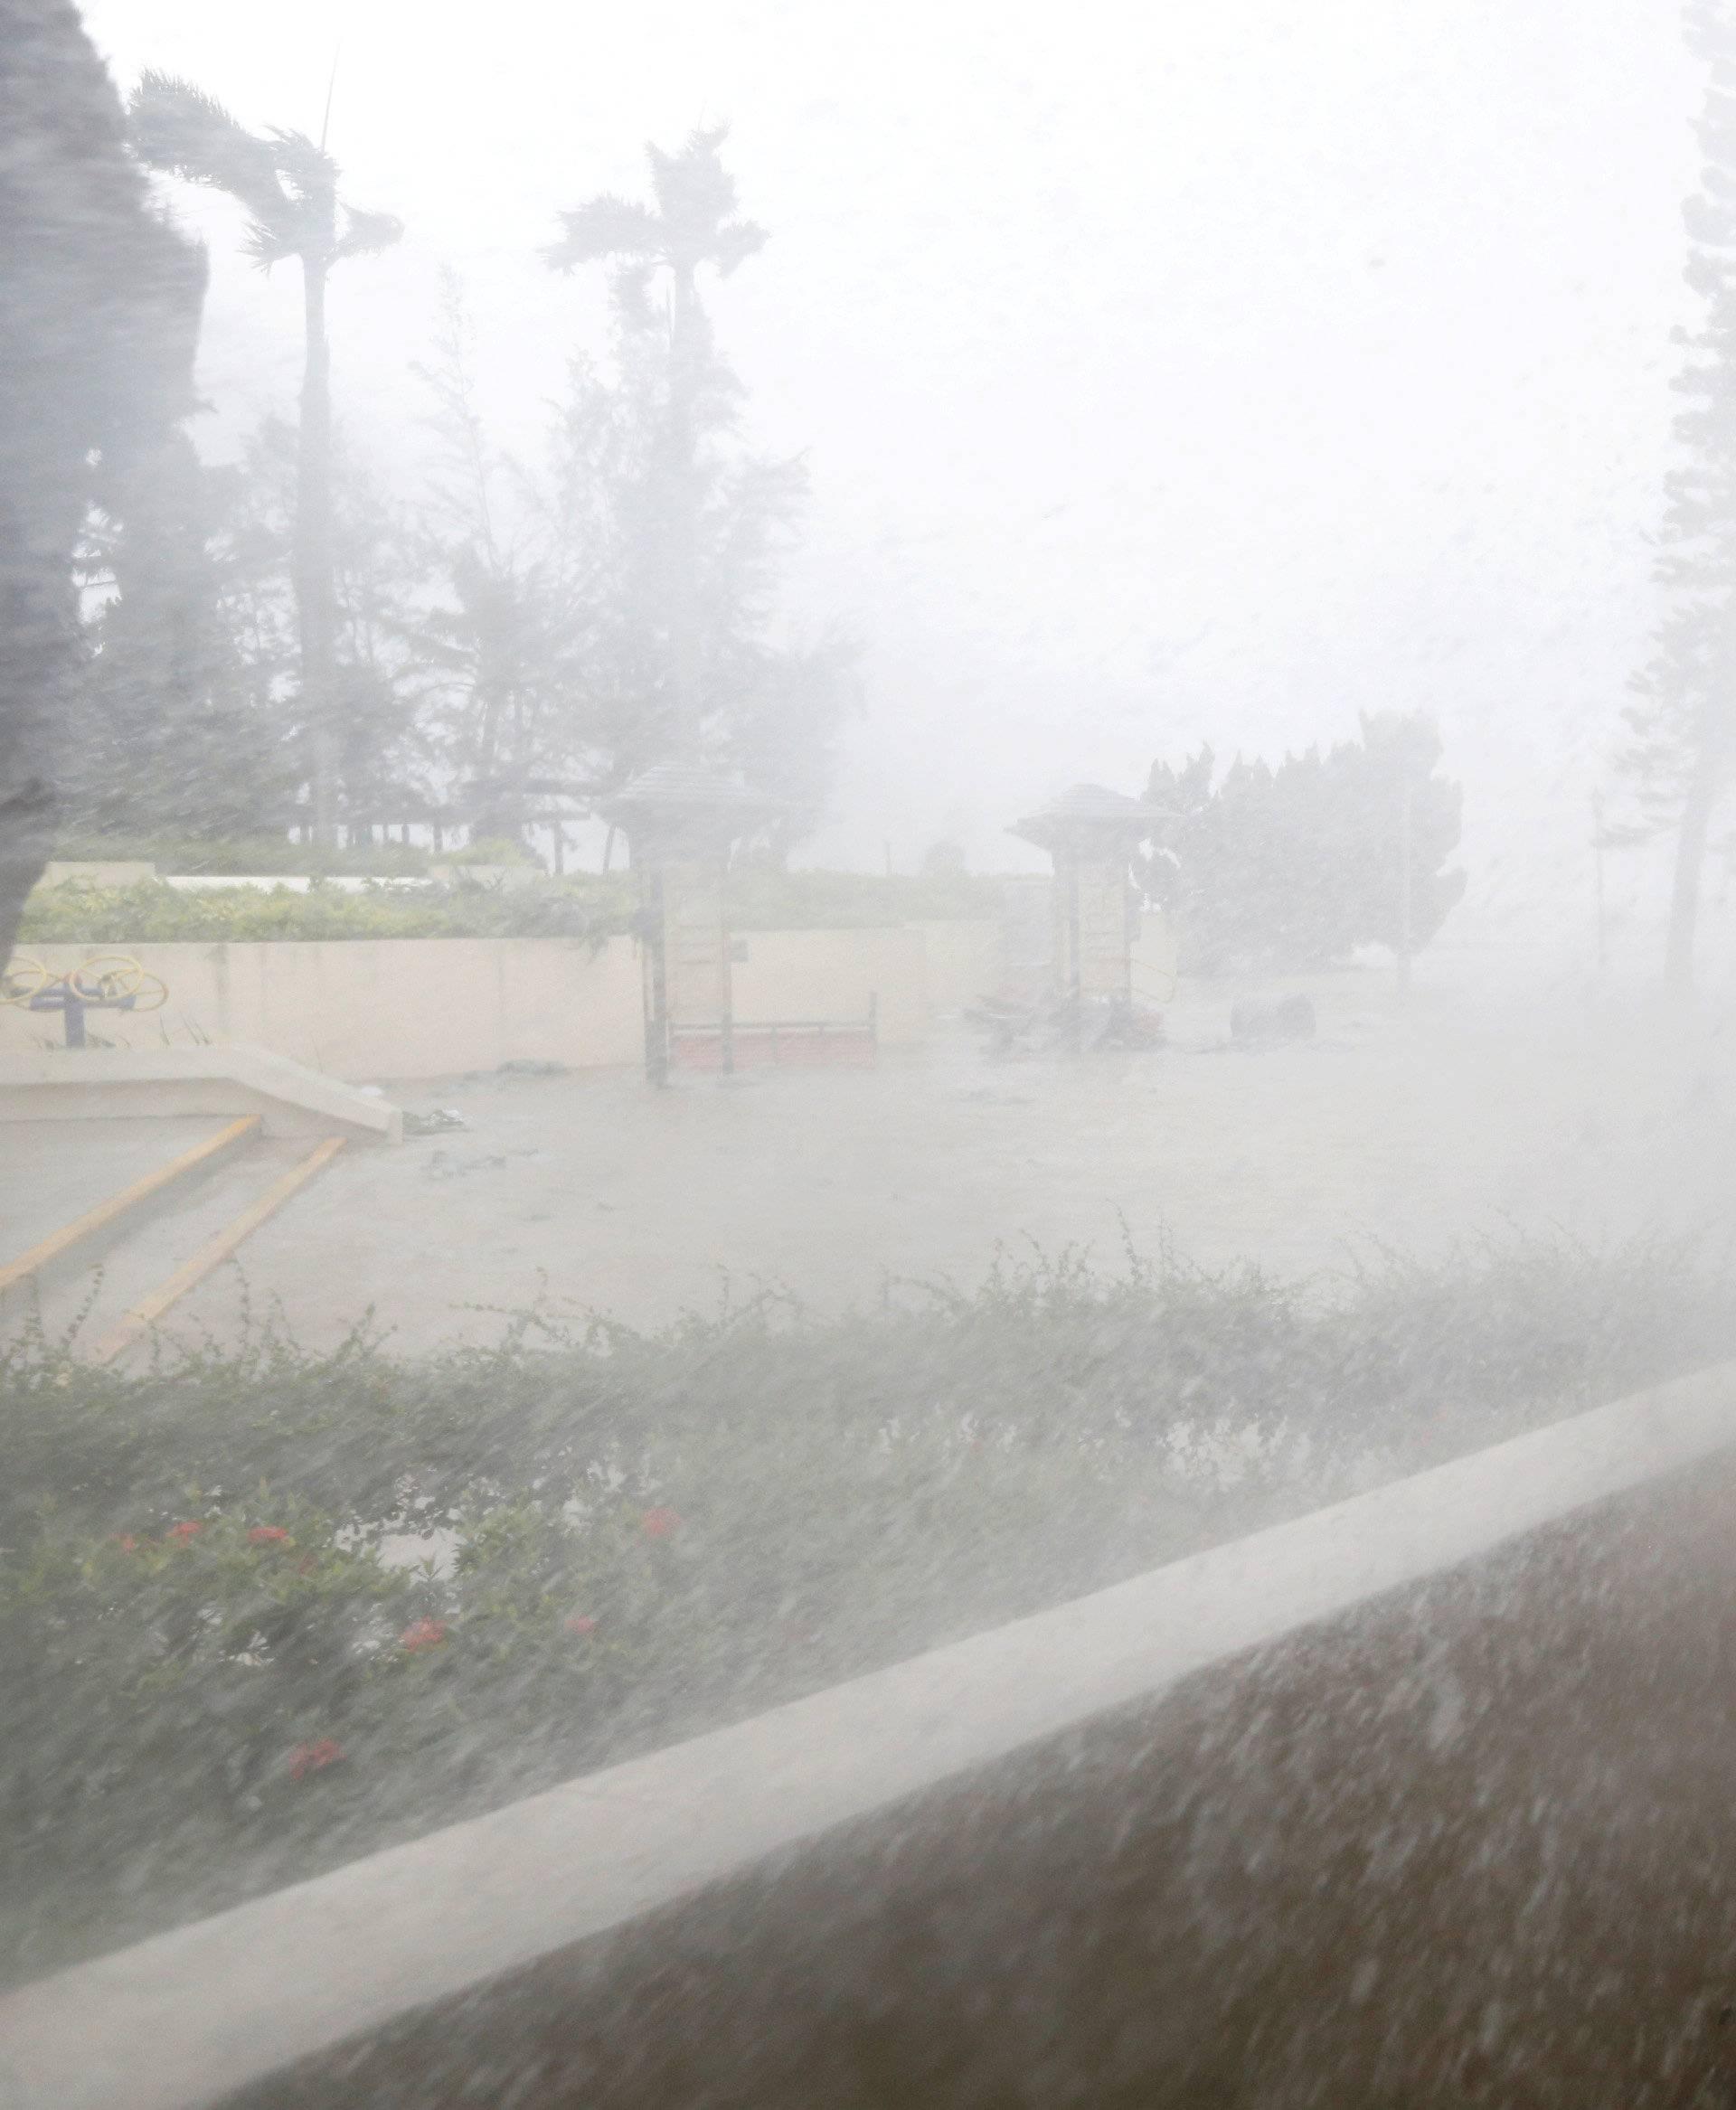 A journalist braves high waves under Typhoon Mangkhut attack in Hong Kong